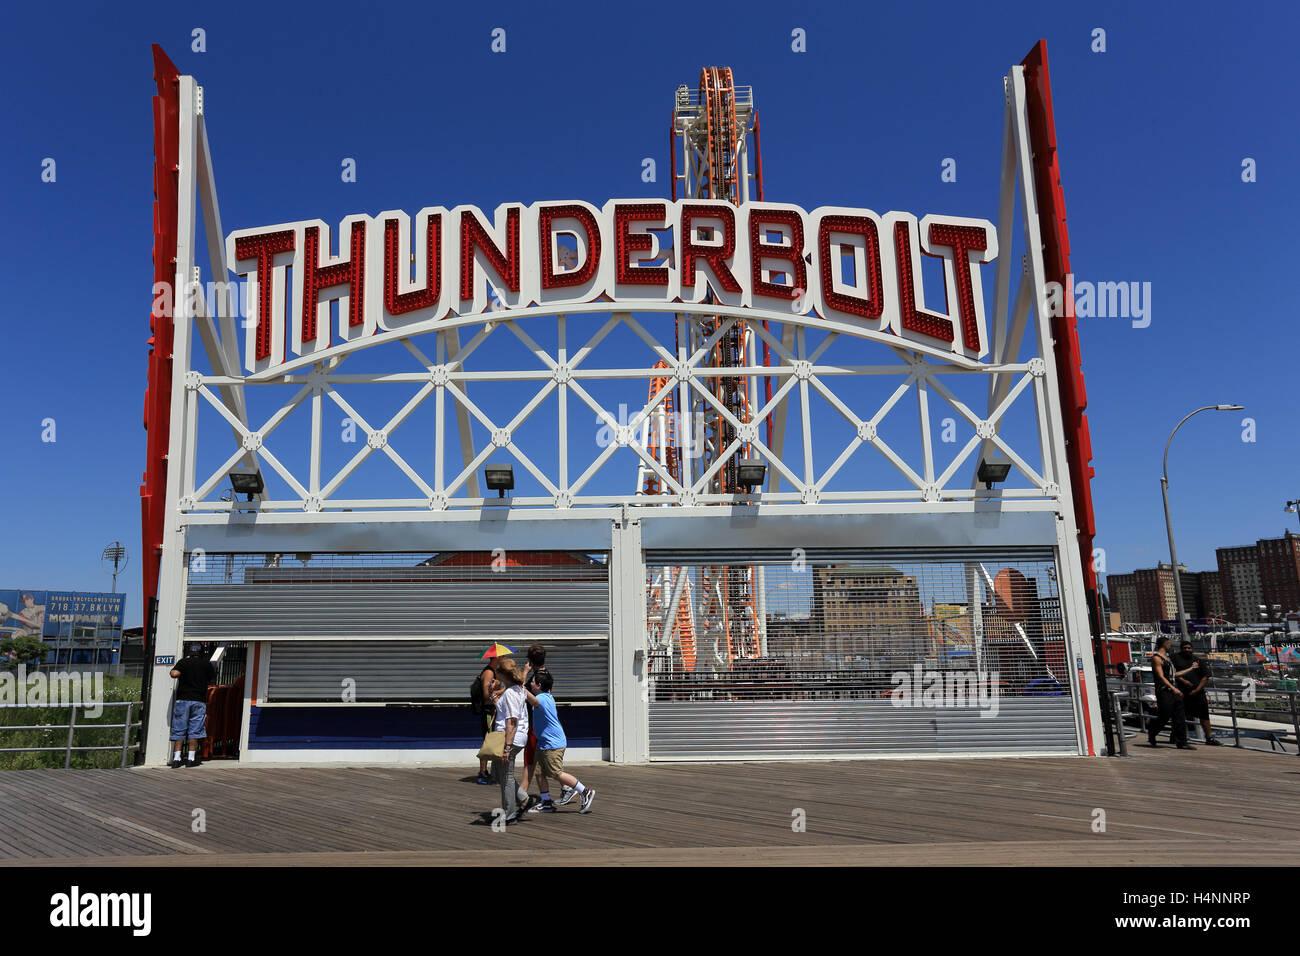 The Thunderbolt roller coaster Coney Island Amusement Park Brooklyn New York City - Stock Image